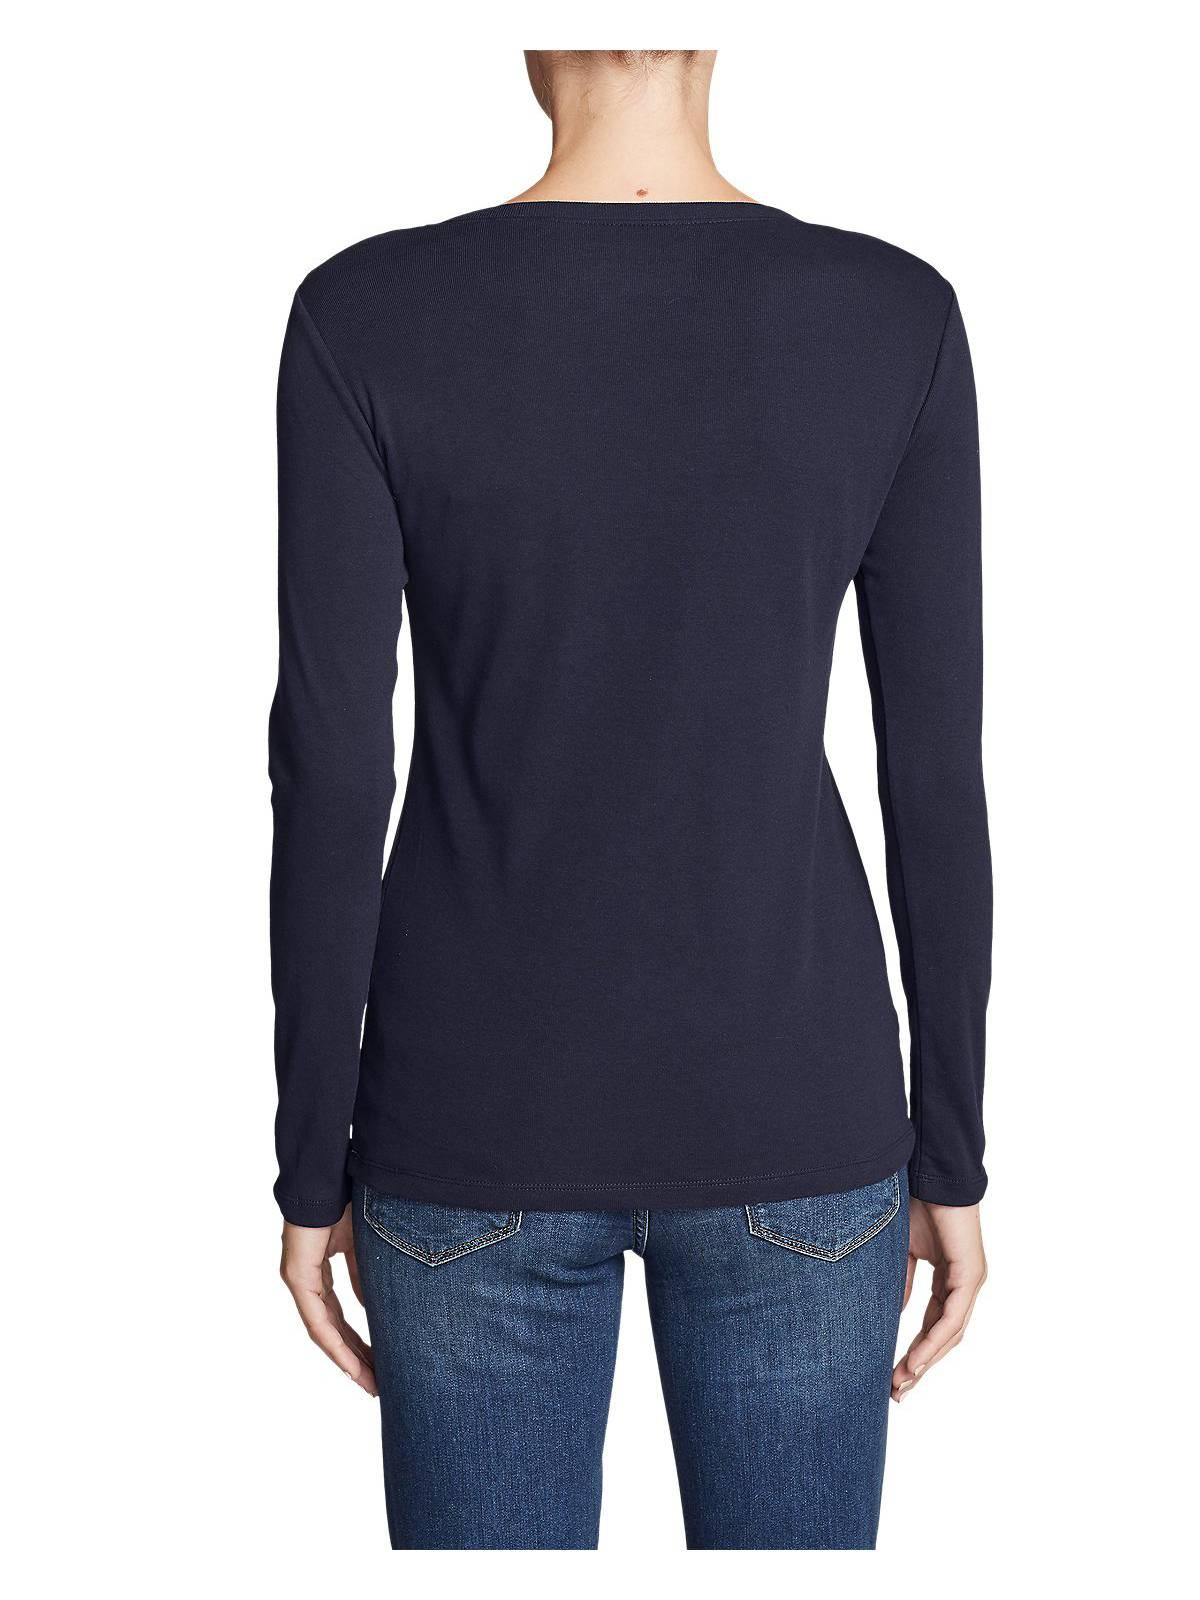 Eddie-Bauer-Women-039-s-Favorite-Long-Sleeve-Crewneck-T-Shirt thumbnail 3